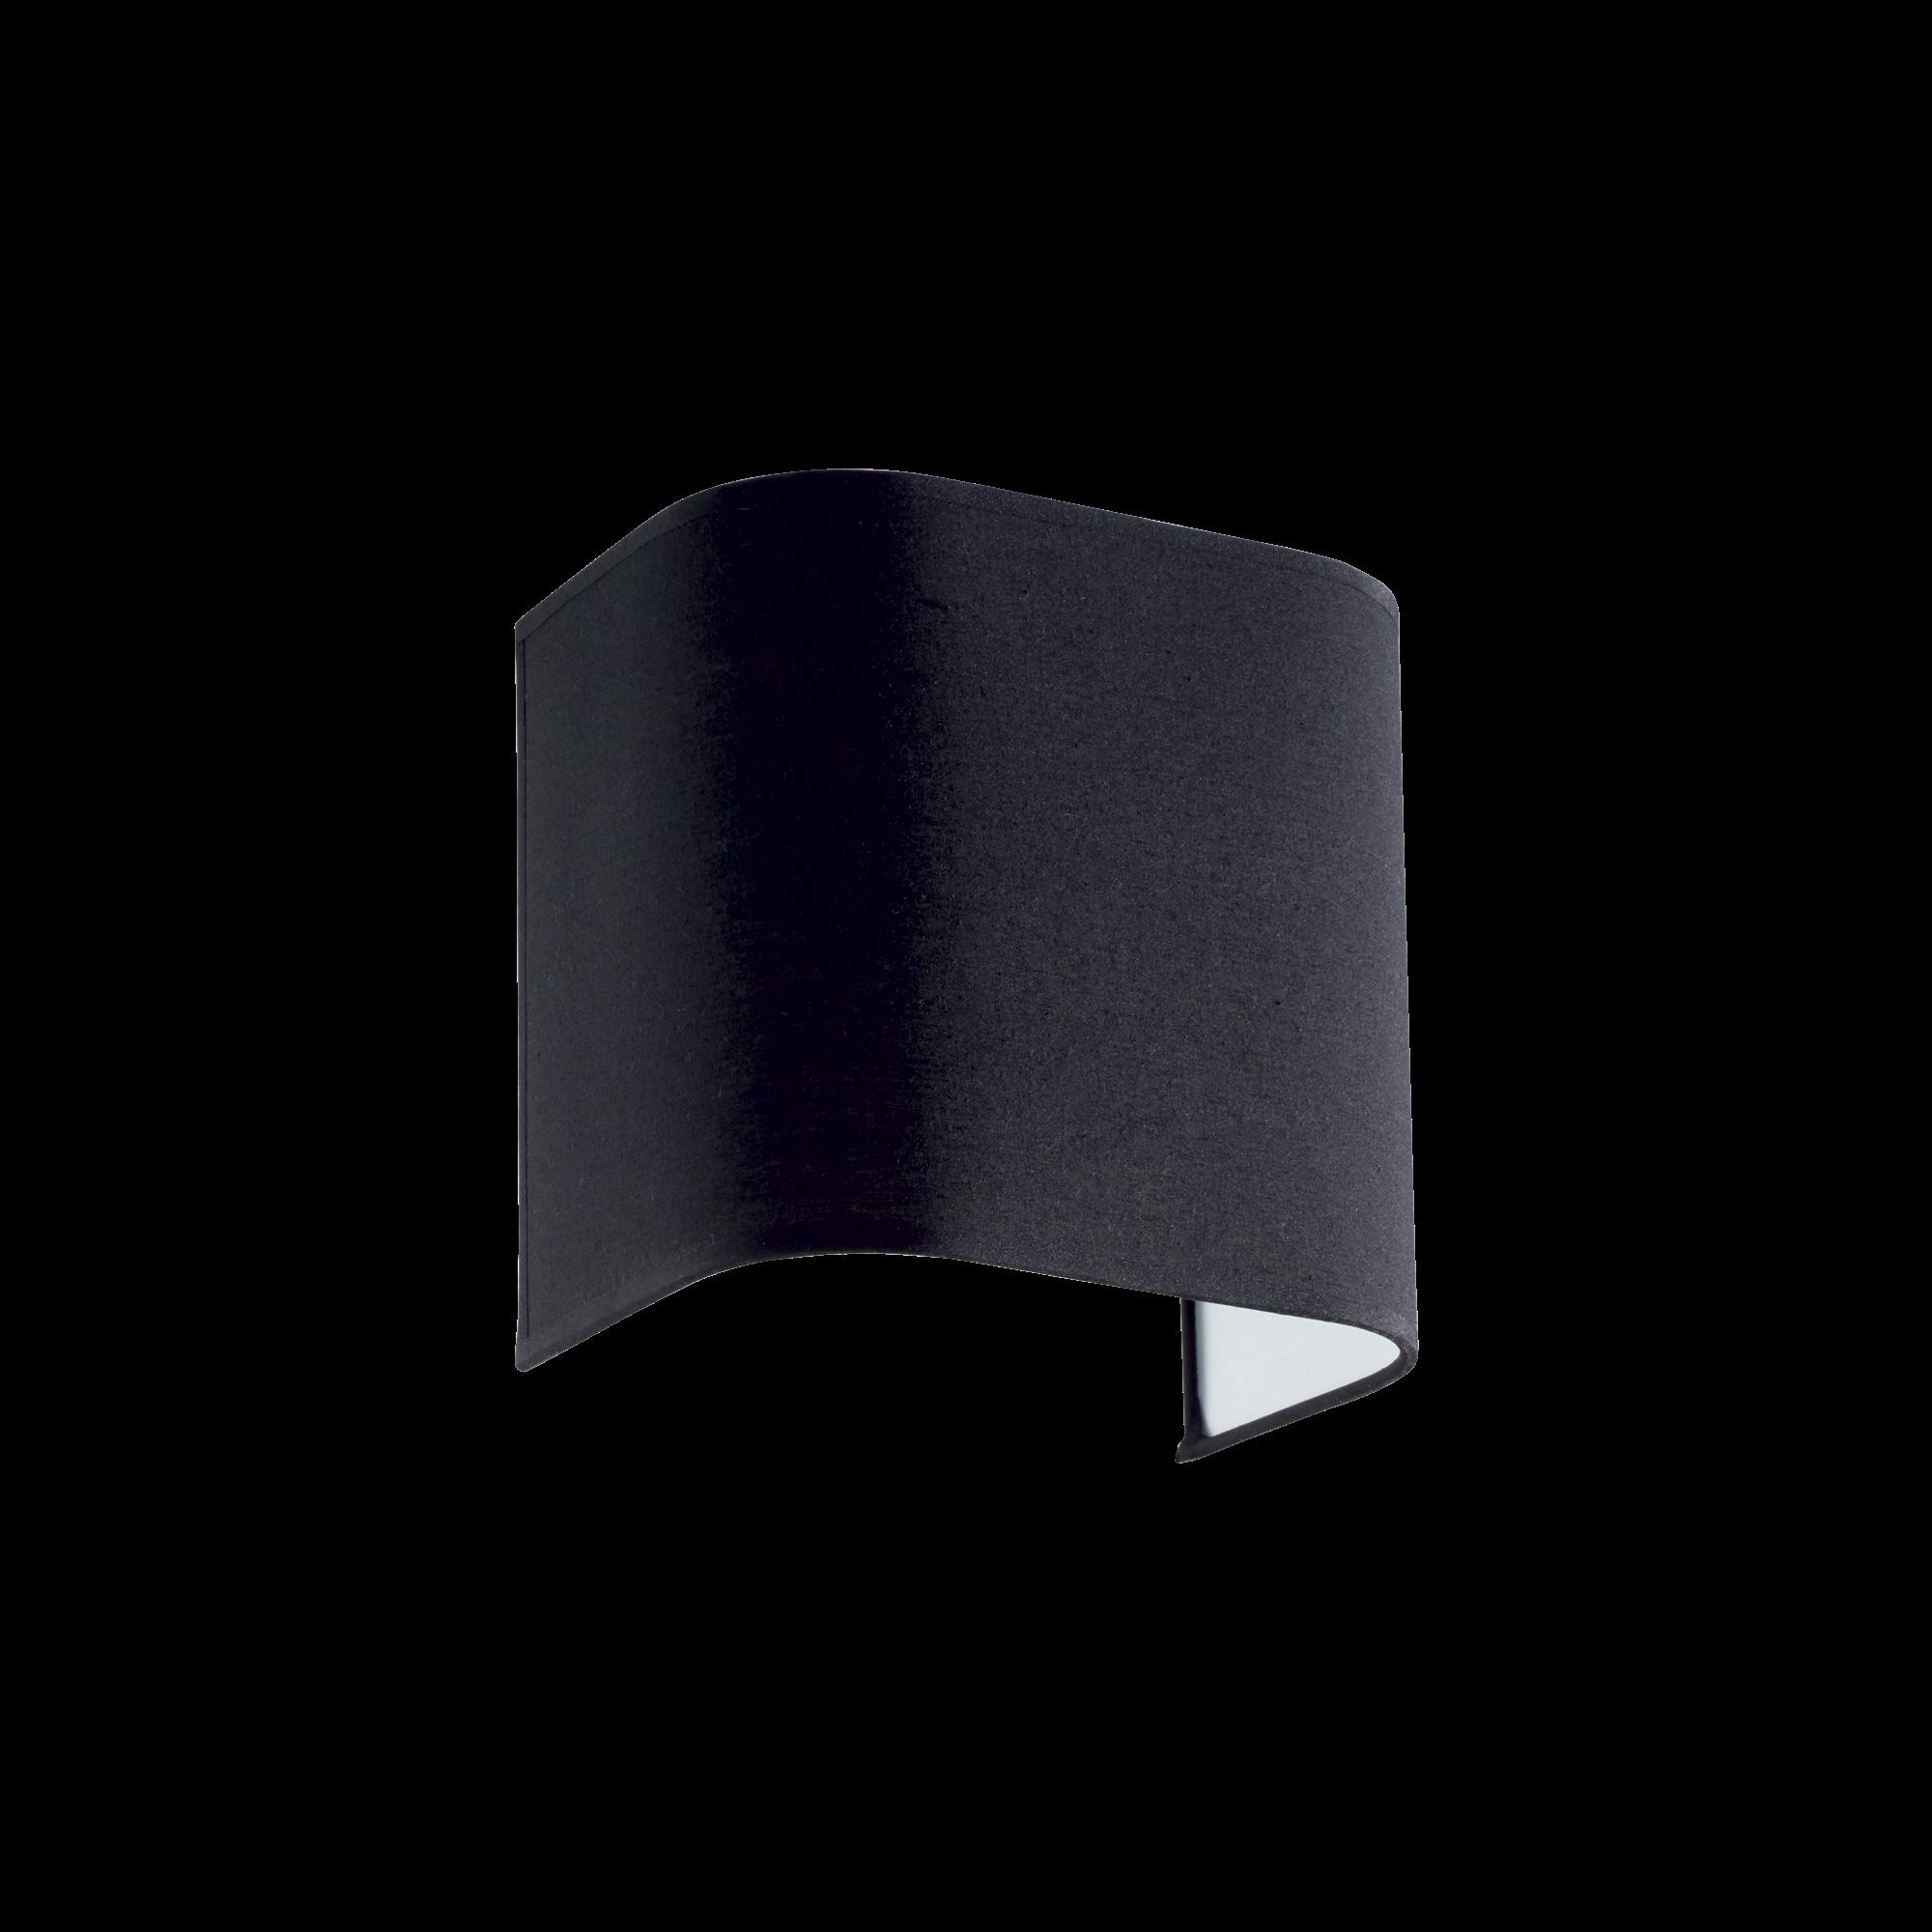 Абажур Ideal Lux Gea Paralume AP2 239590, черный, текстиль - фото 1